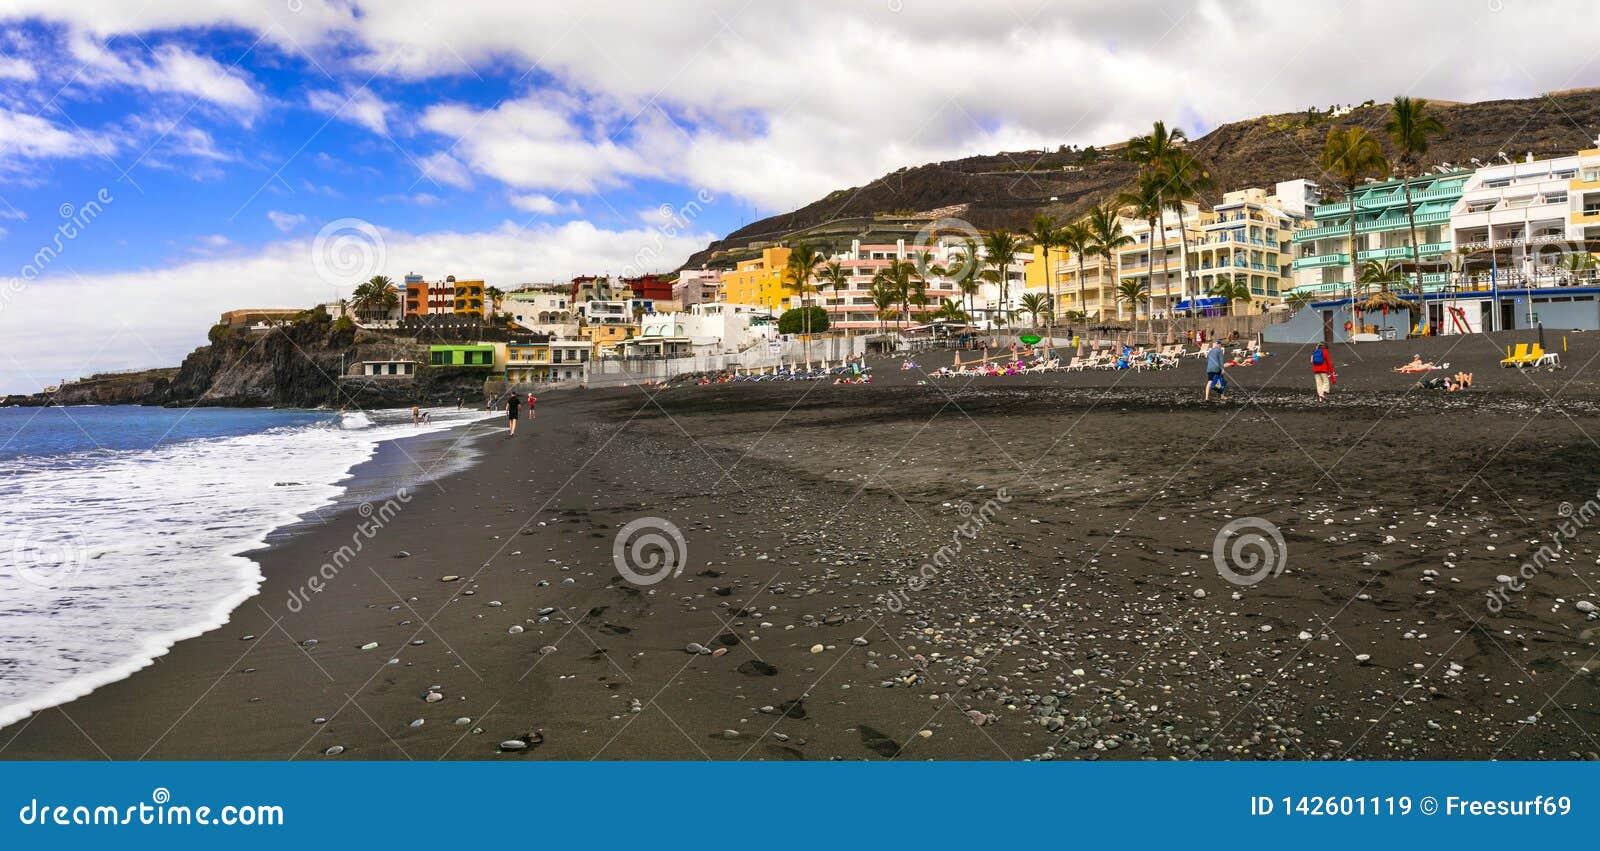 NAO (Εθνικός Οργανισμός Διαιτησίας) Puerto - μεγαλύτερη και όμορφη μαύρη πα